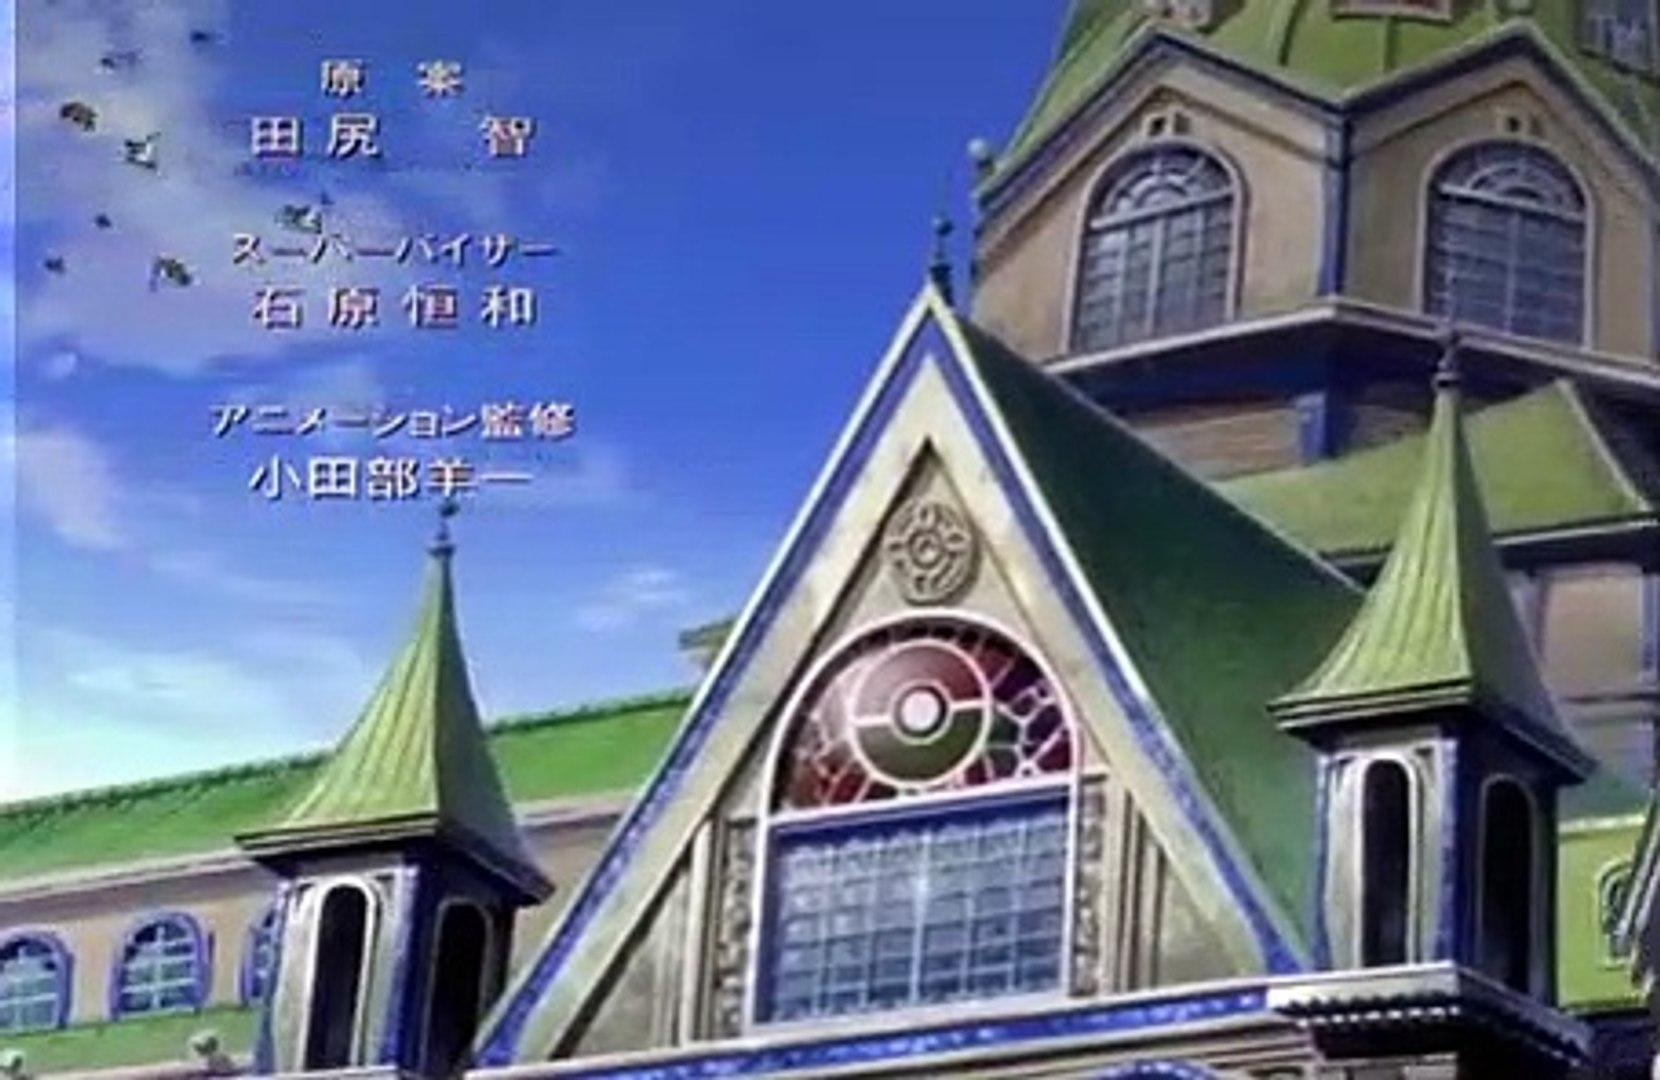 Pokemon S05m01 Heroes Latios And Latias Japanese Credits 2002 360p Re Dvdrip Part 2 2 Video Dailymotion